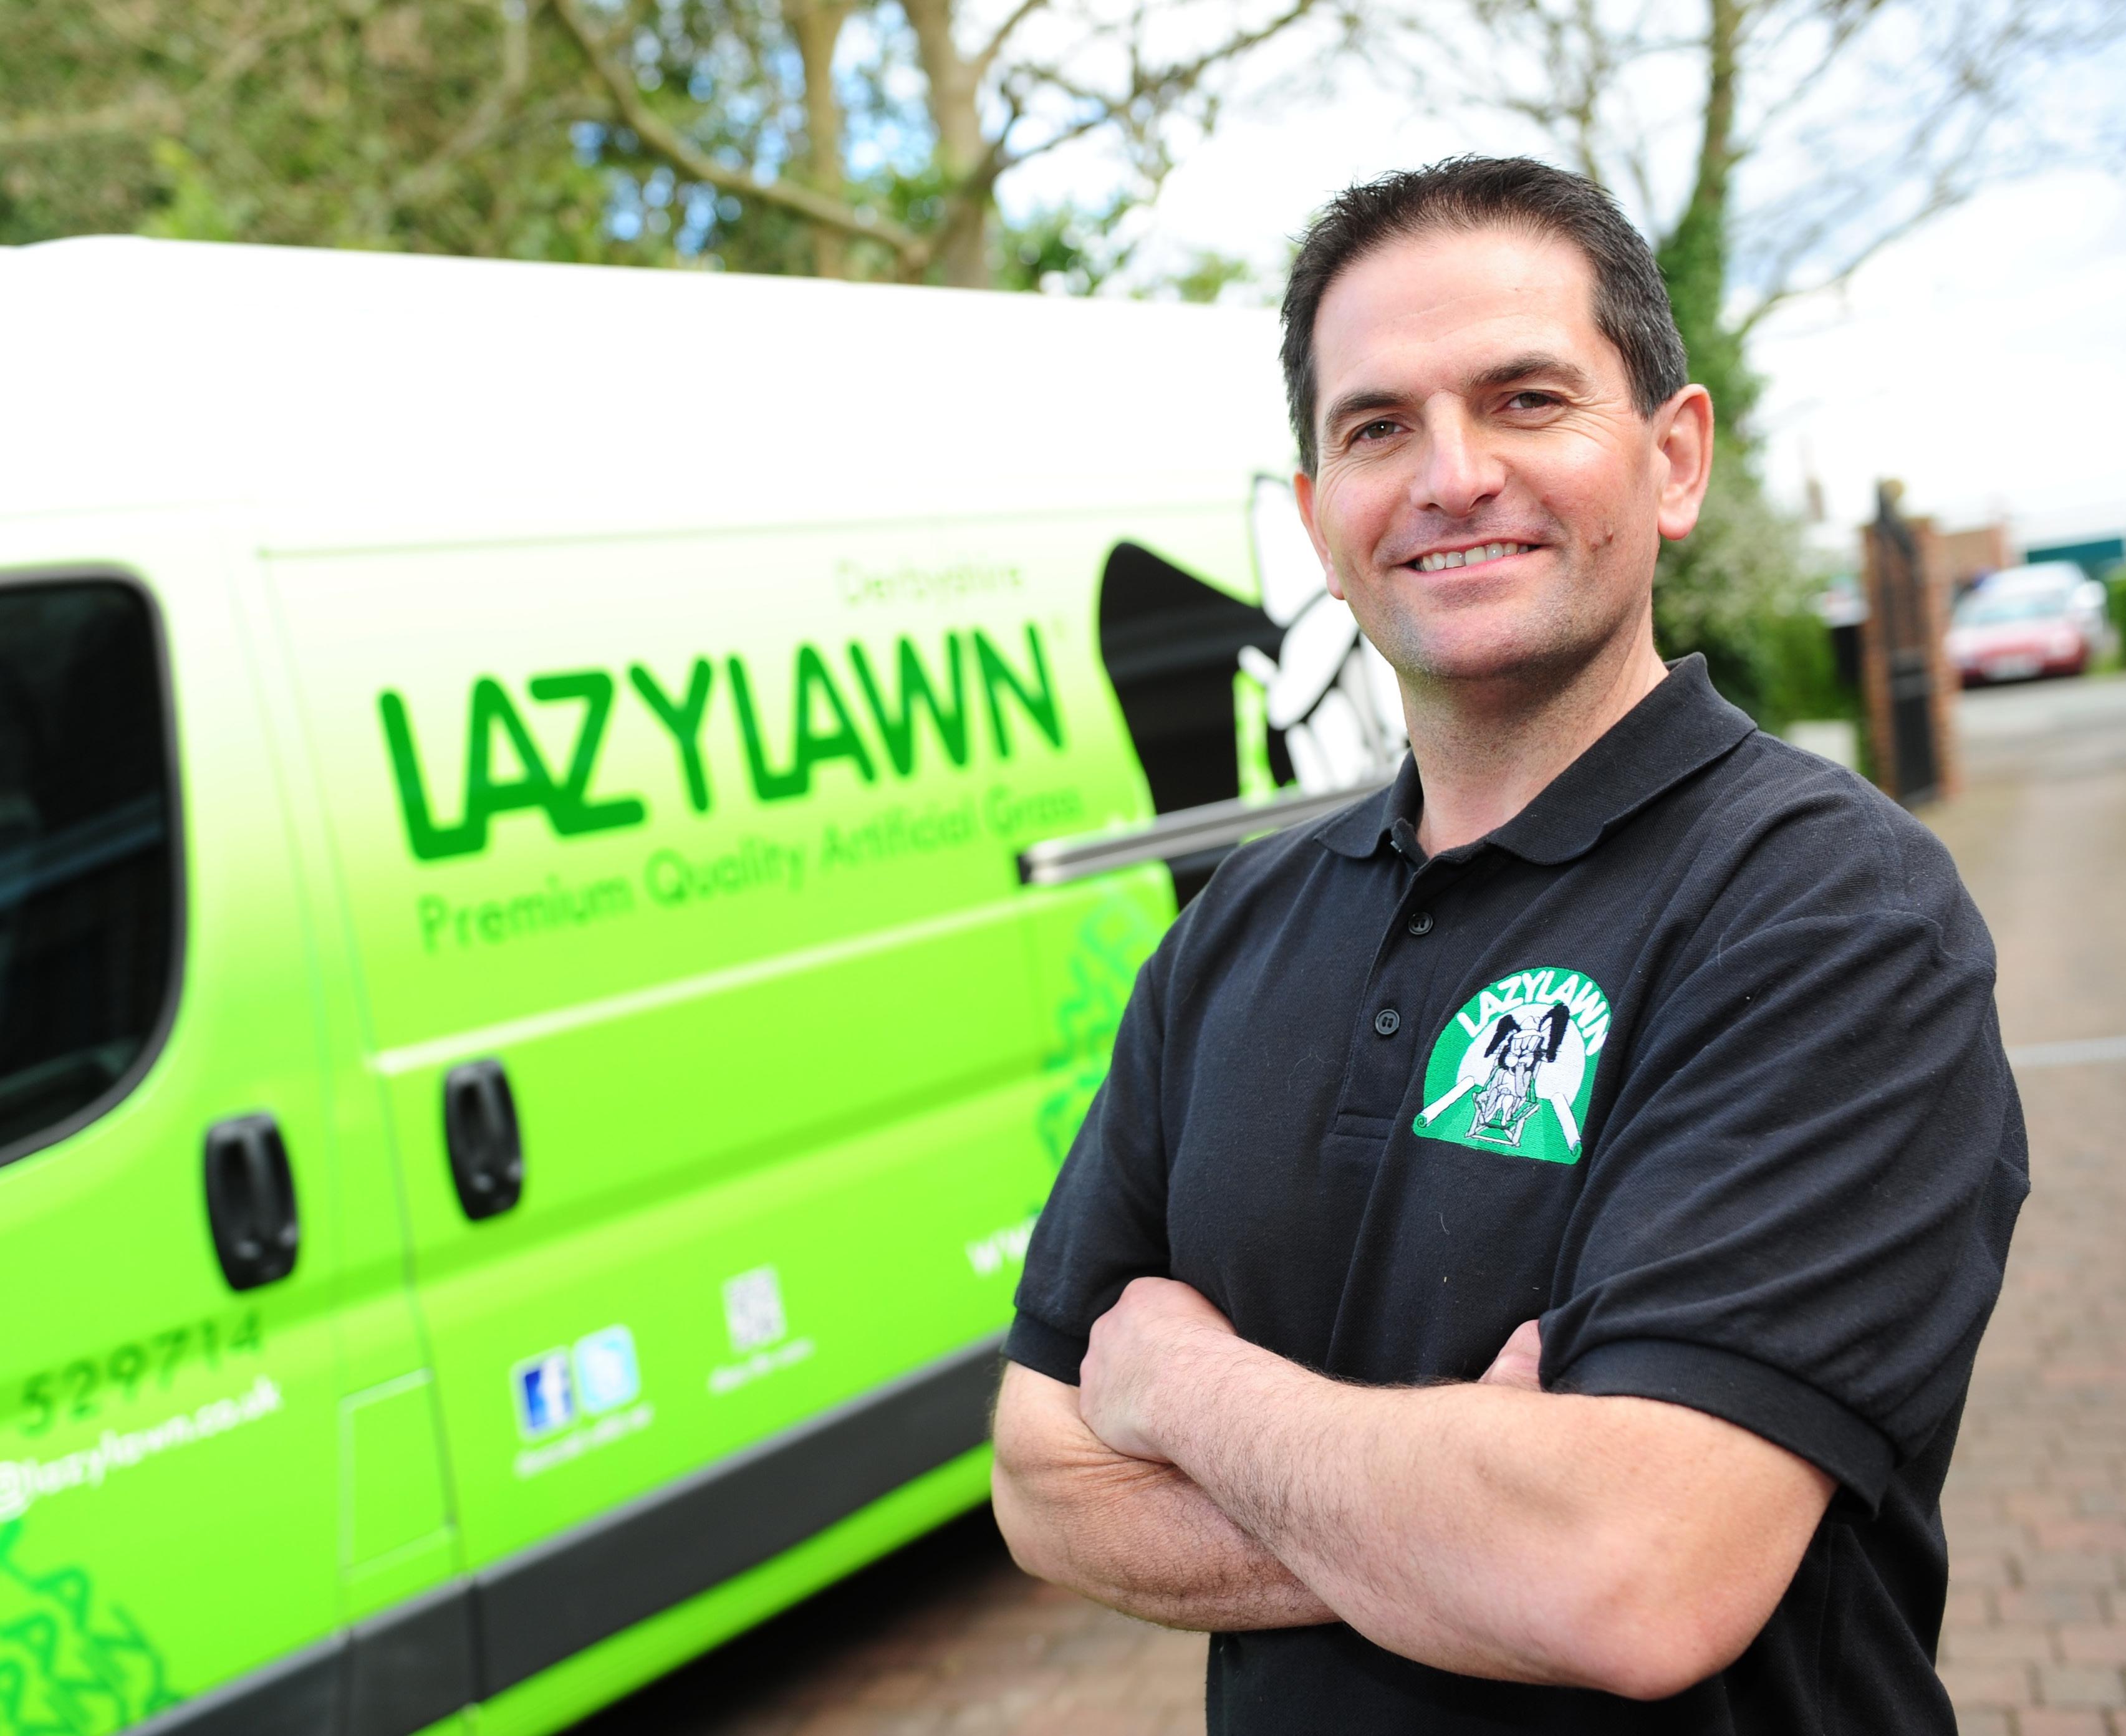 LazyLawn® South Wales